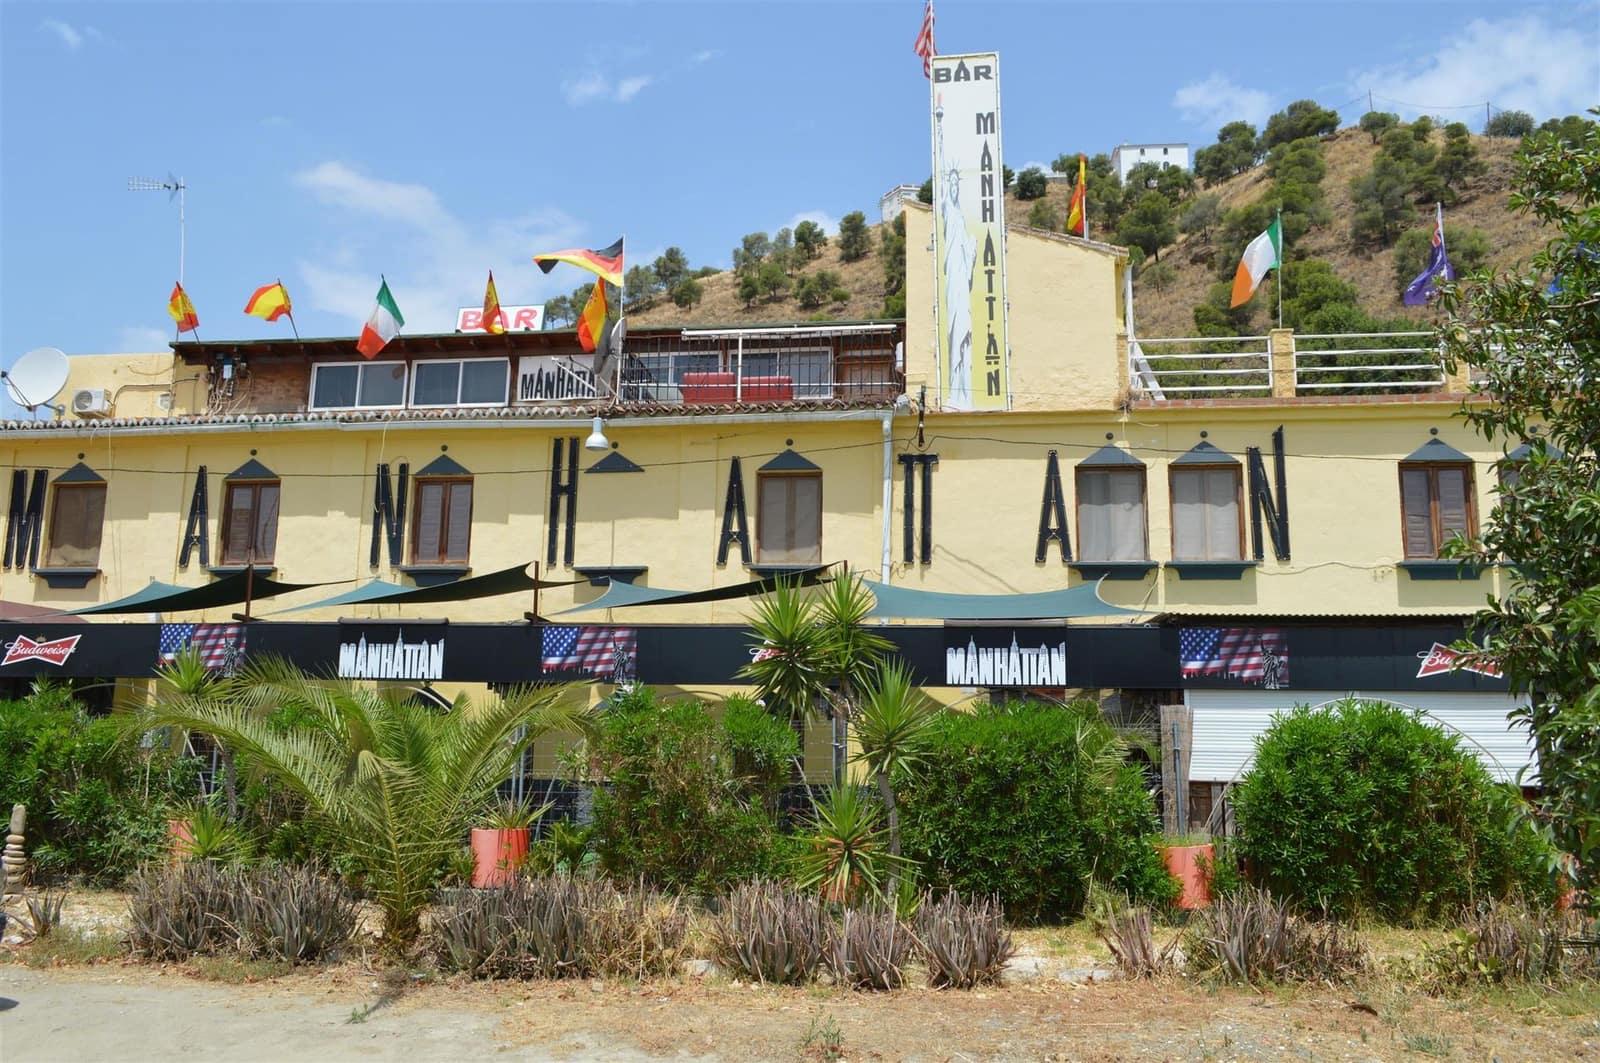 9 chambre Villa/Maison à vendre à Alora - 499 000 € (Ref: 4688864)